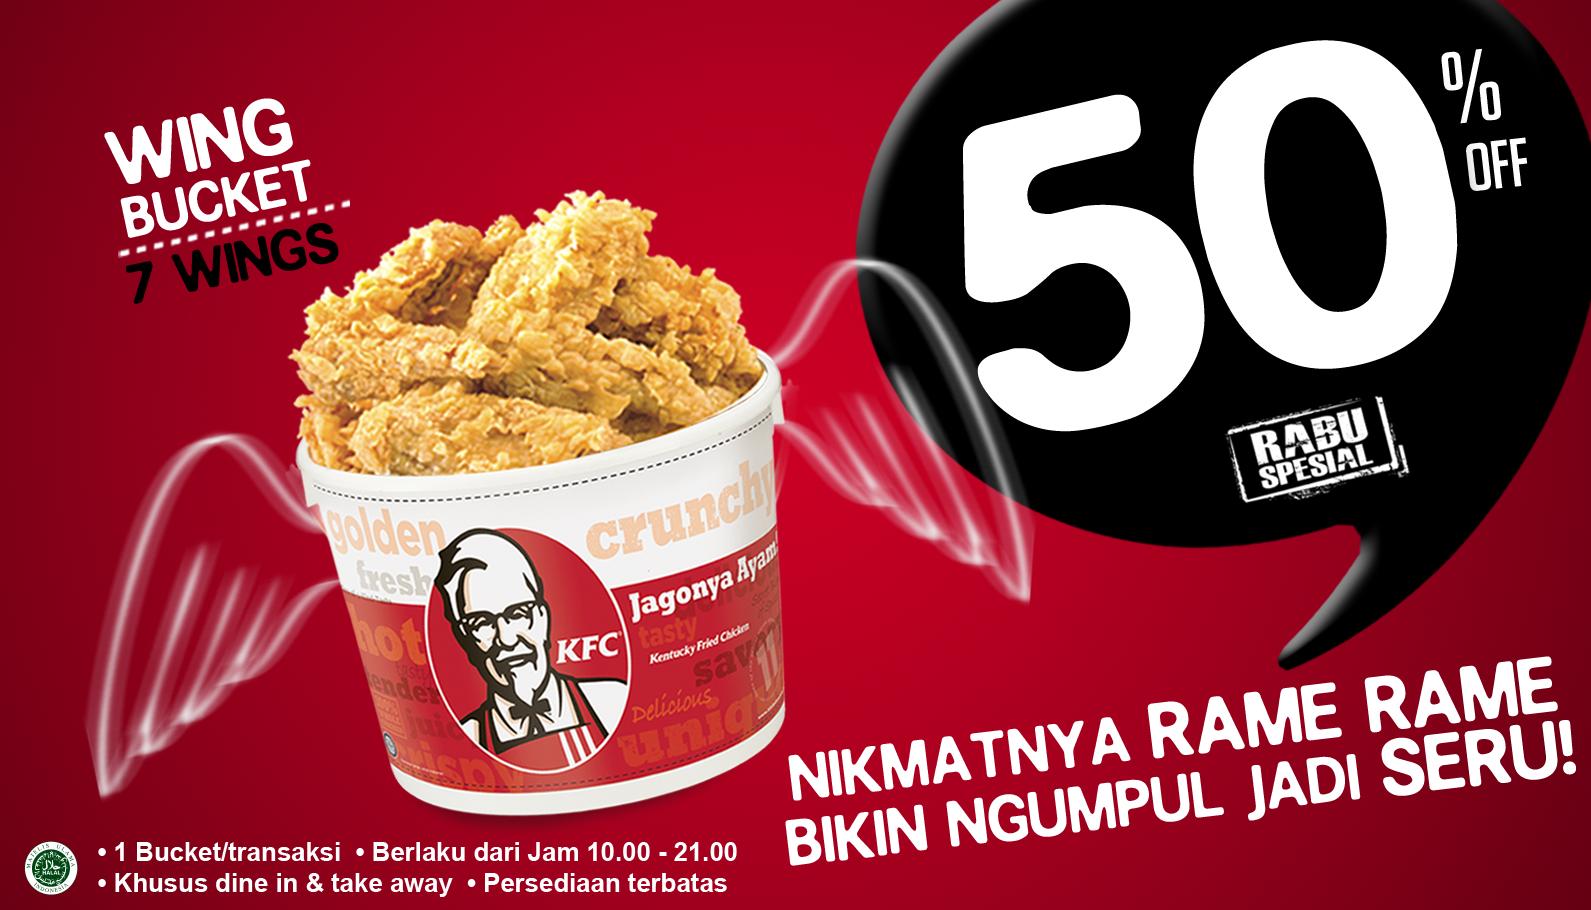 Kuliner Ok: KFC Rabu Special 15 Januari 2014